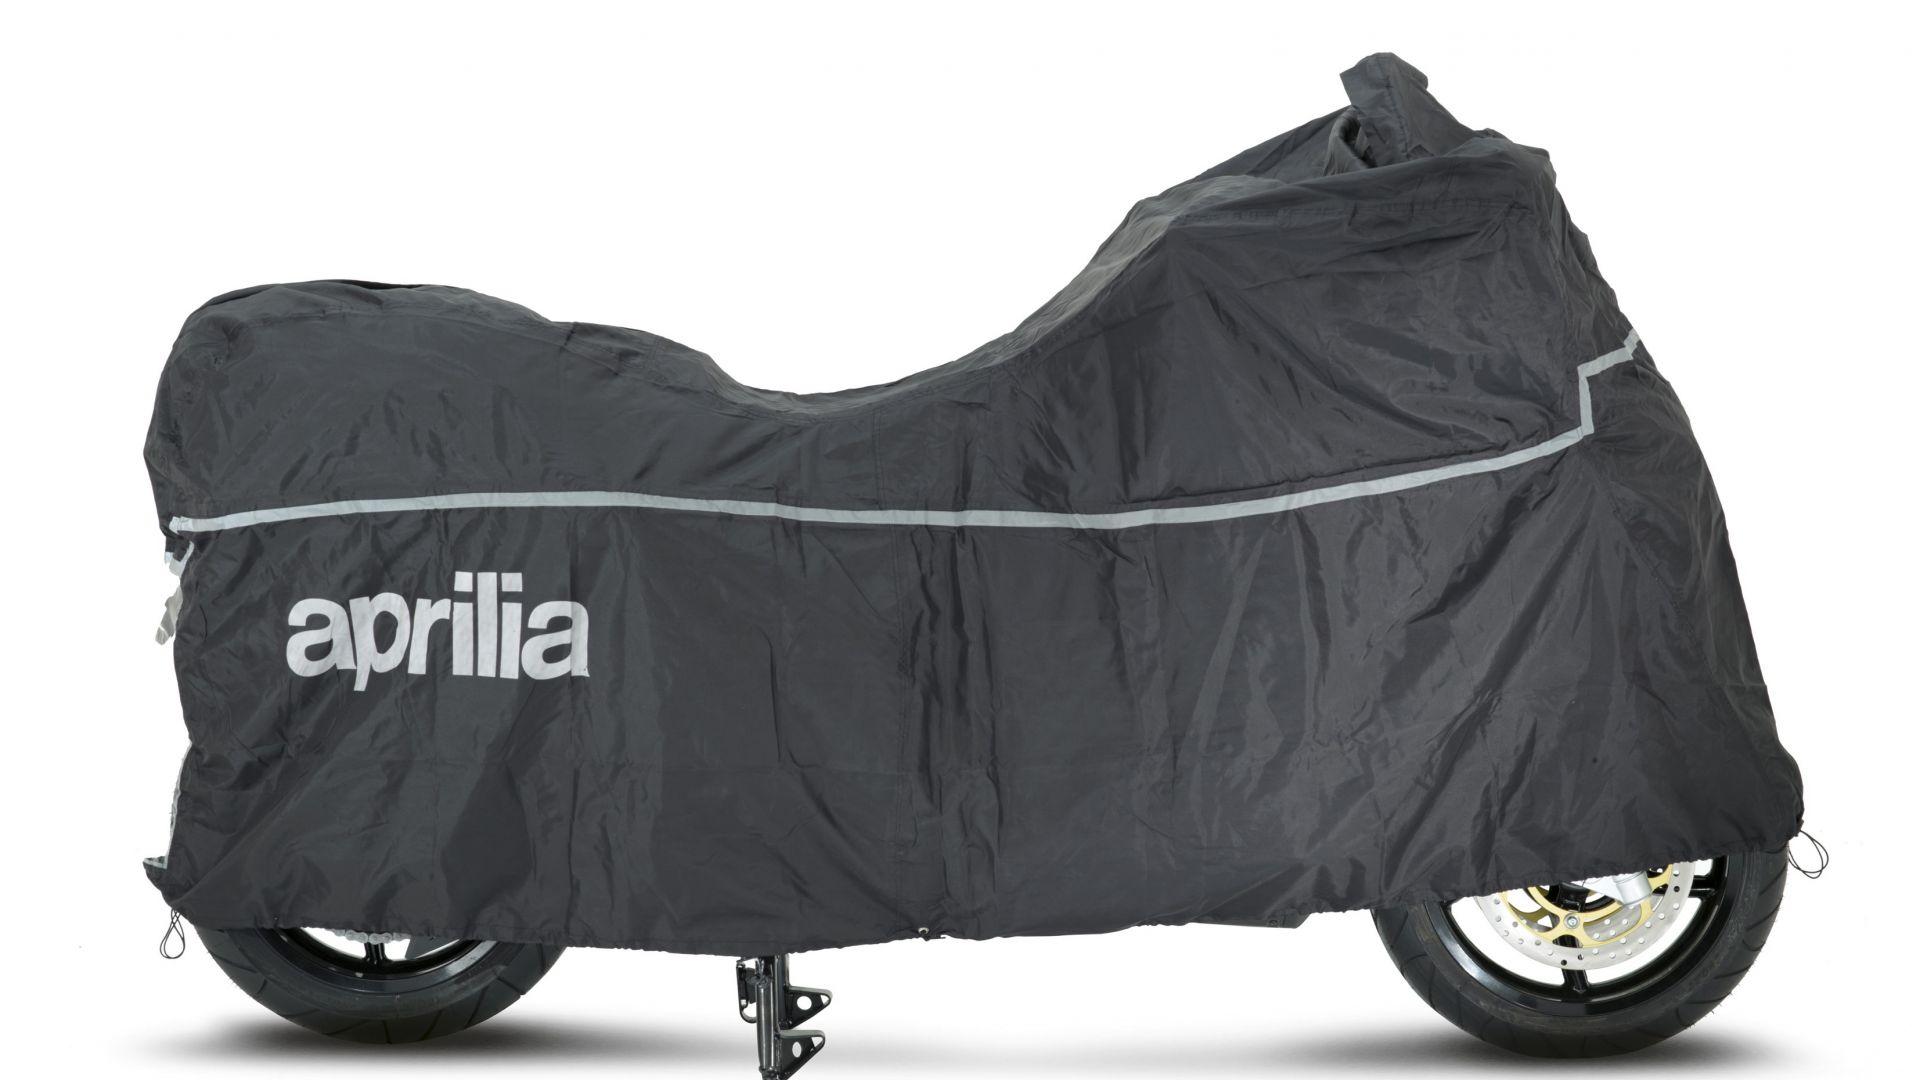 Immagine 50: Aprilia SRV 850 ABS/ATC